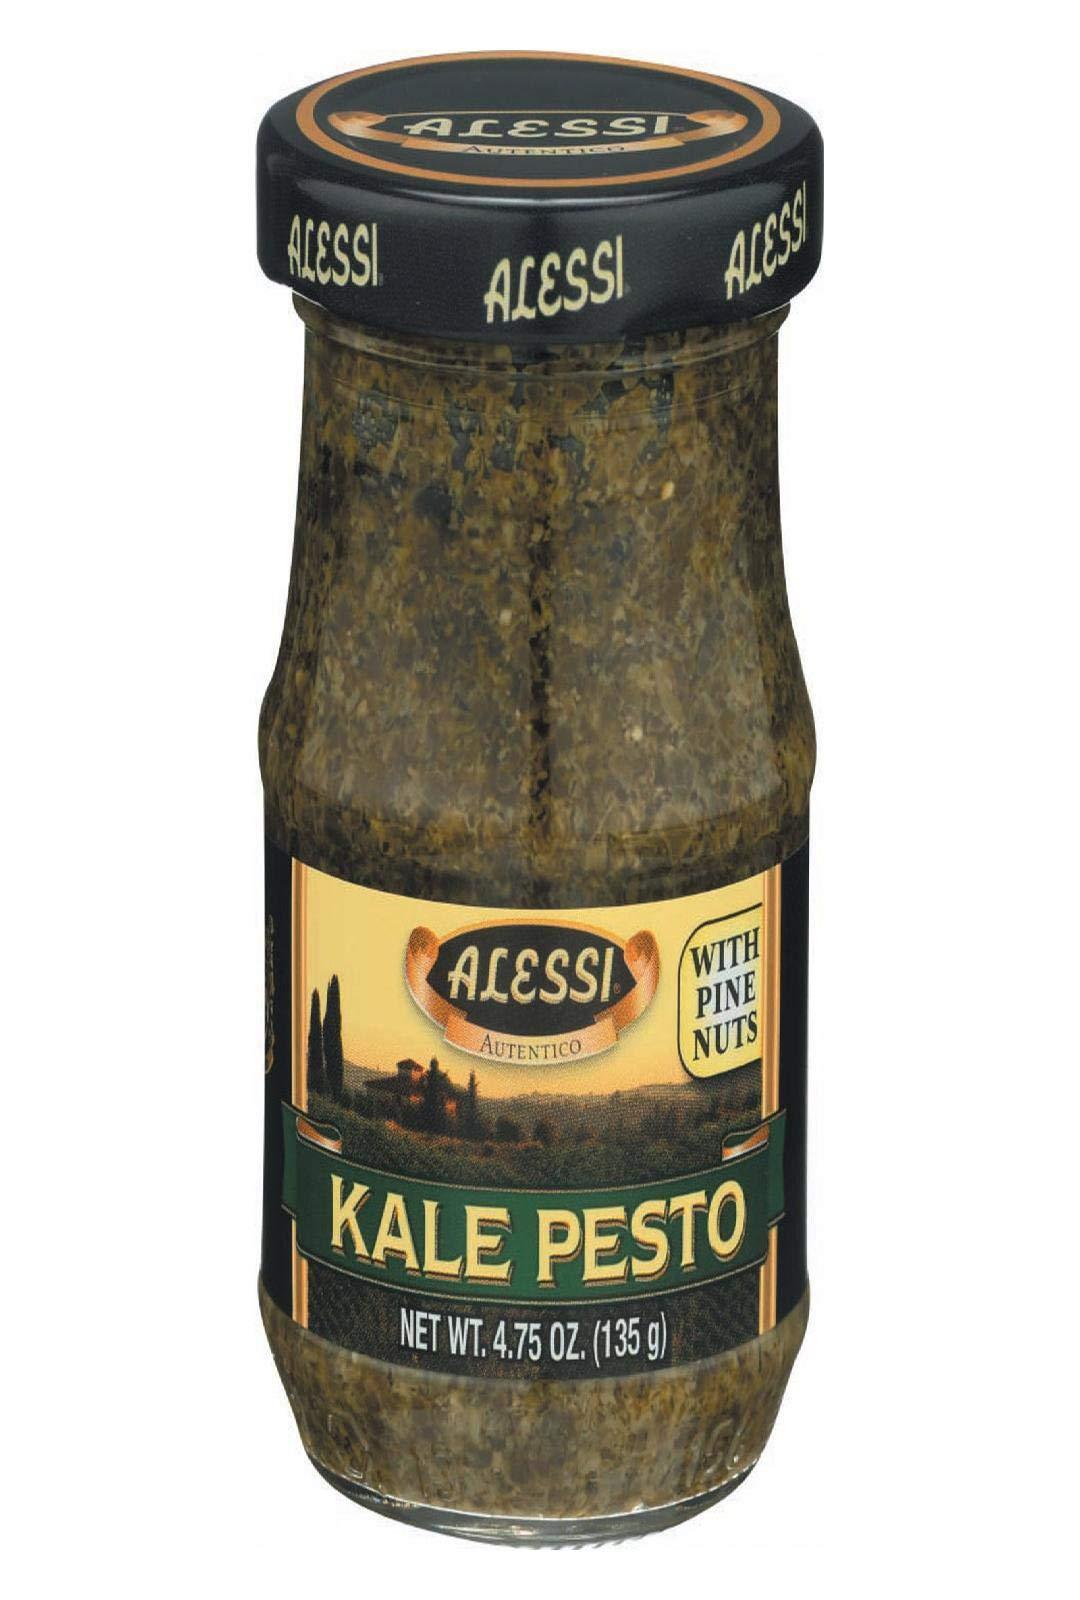 ALESSI, PESTO, KALE, Pack of 6, Size 4.75 OZ - No Artificial Ingredients Wheat Free